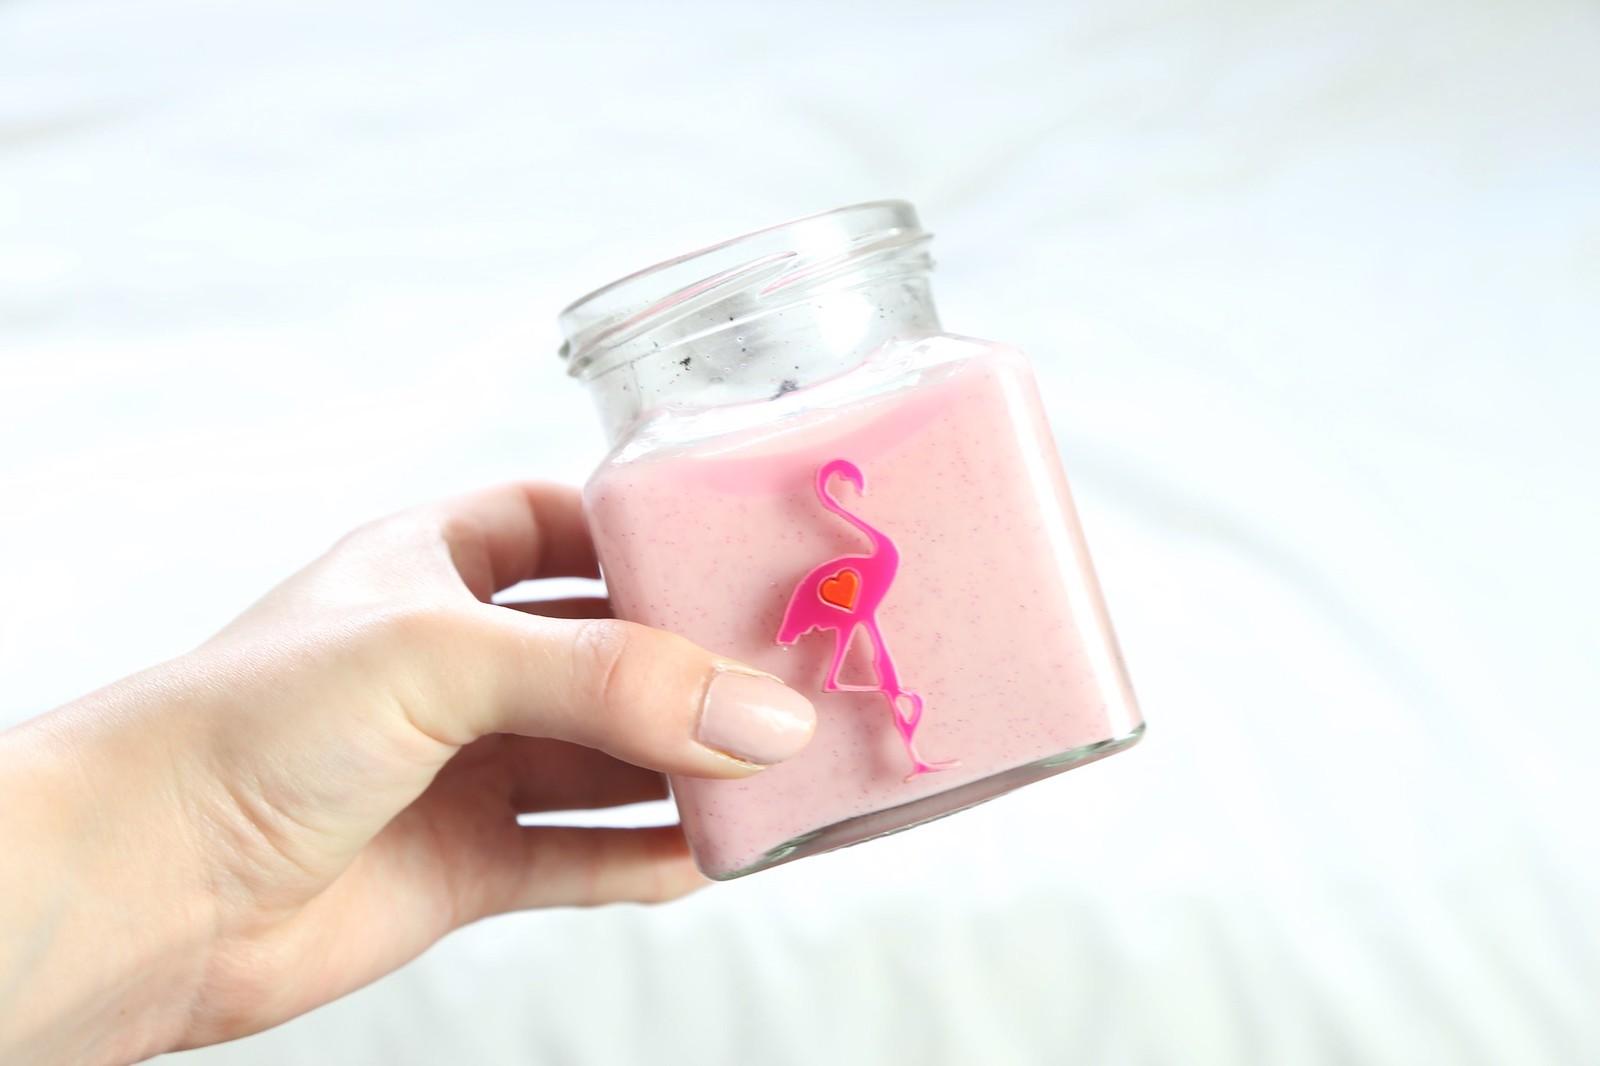 krystelcouture, flamingocandles, lovebug, organiccandles, lifestyleblog,